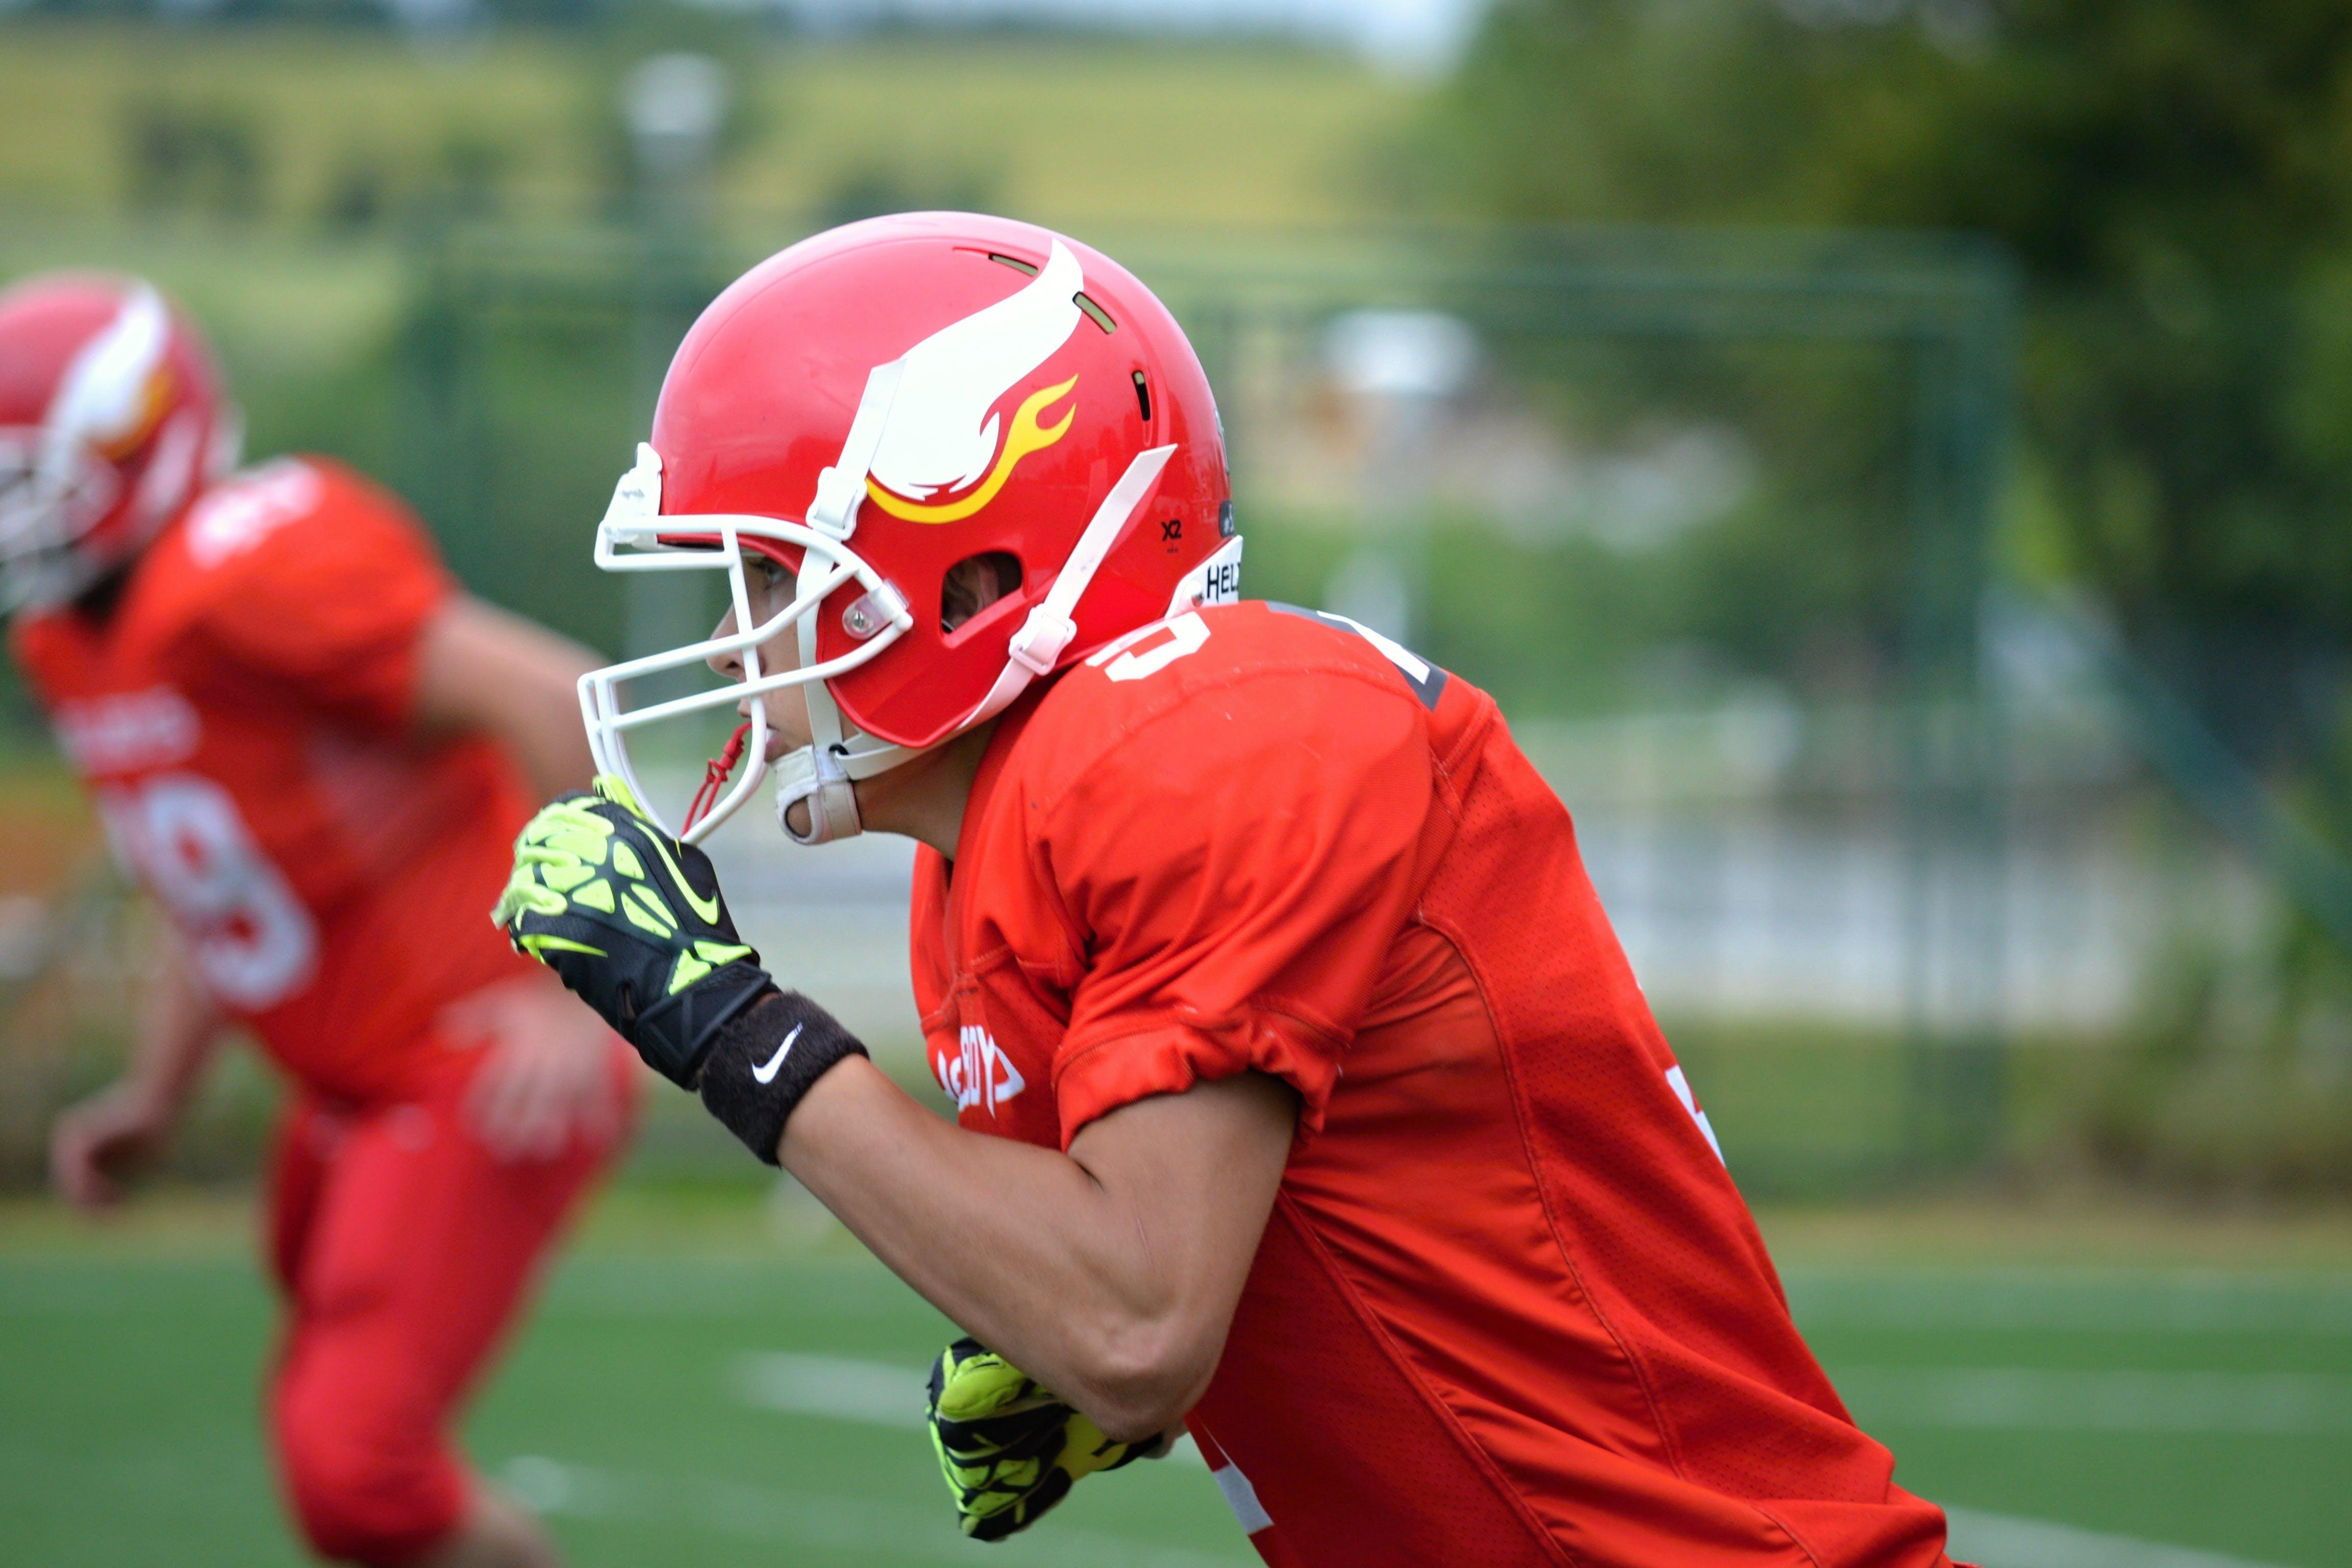 athlete, fight, football